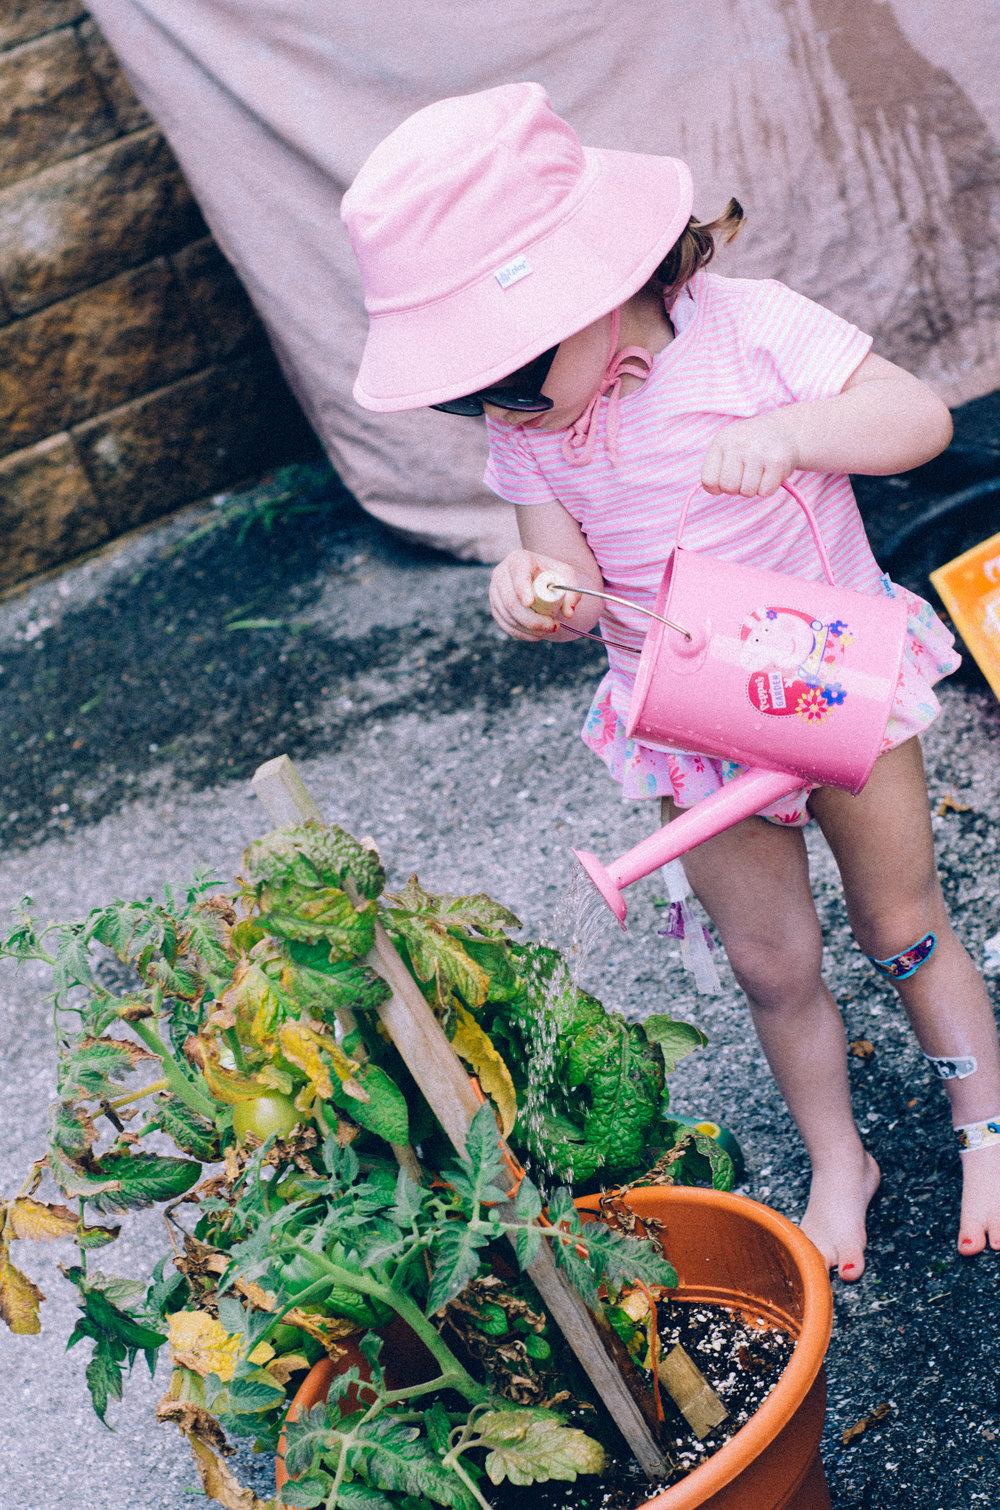 10 Reasons to Garden with Kids - iPlay- shegotguts.com